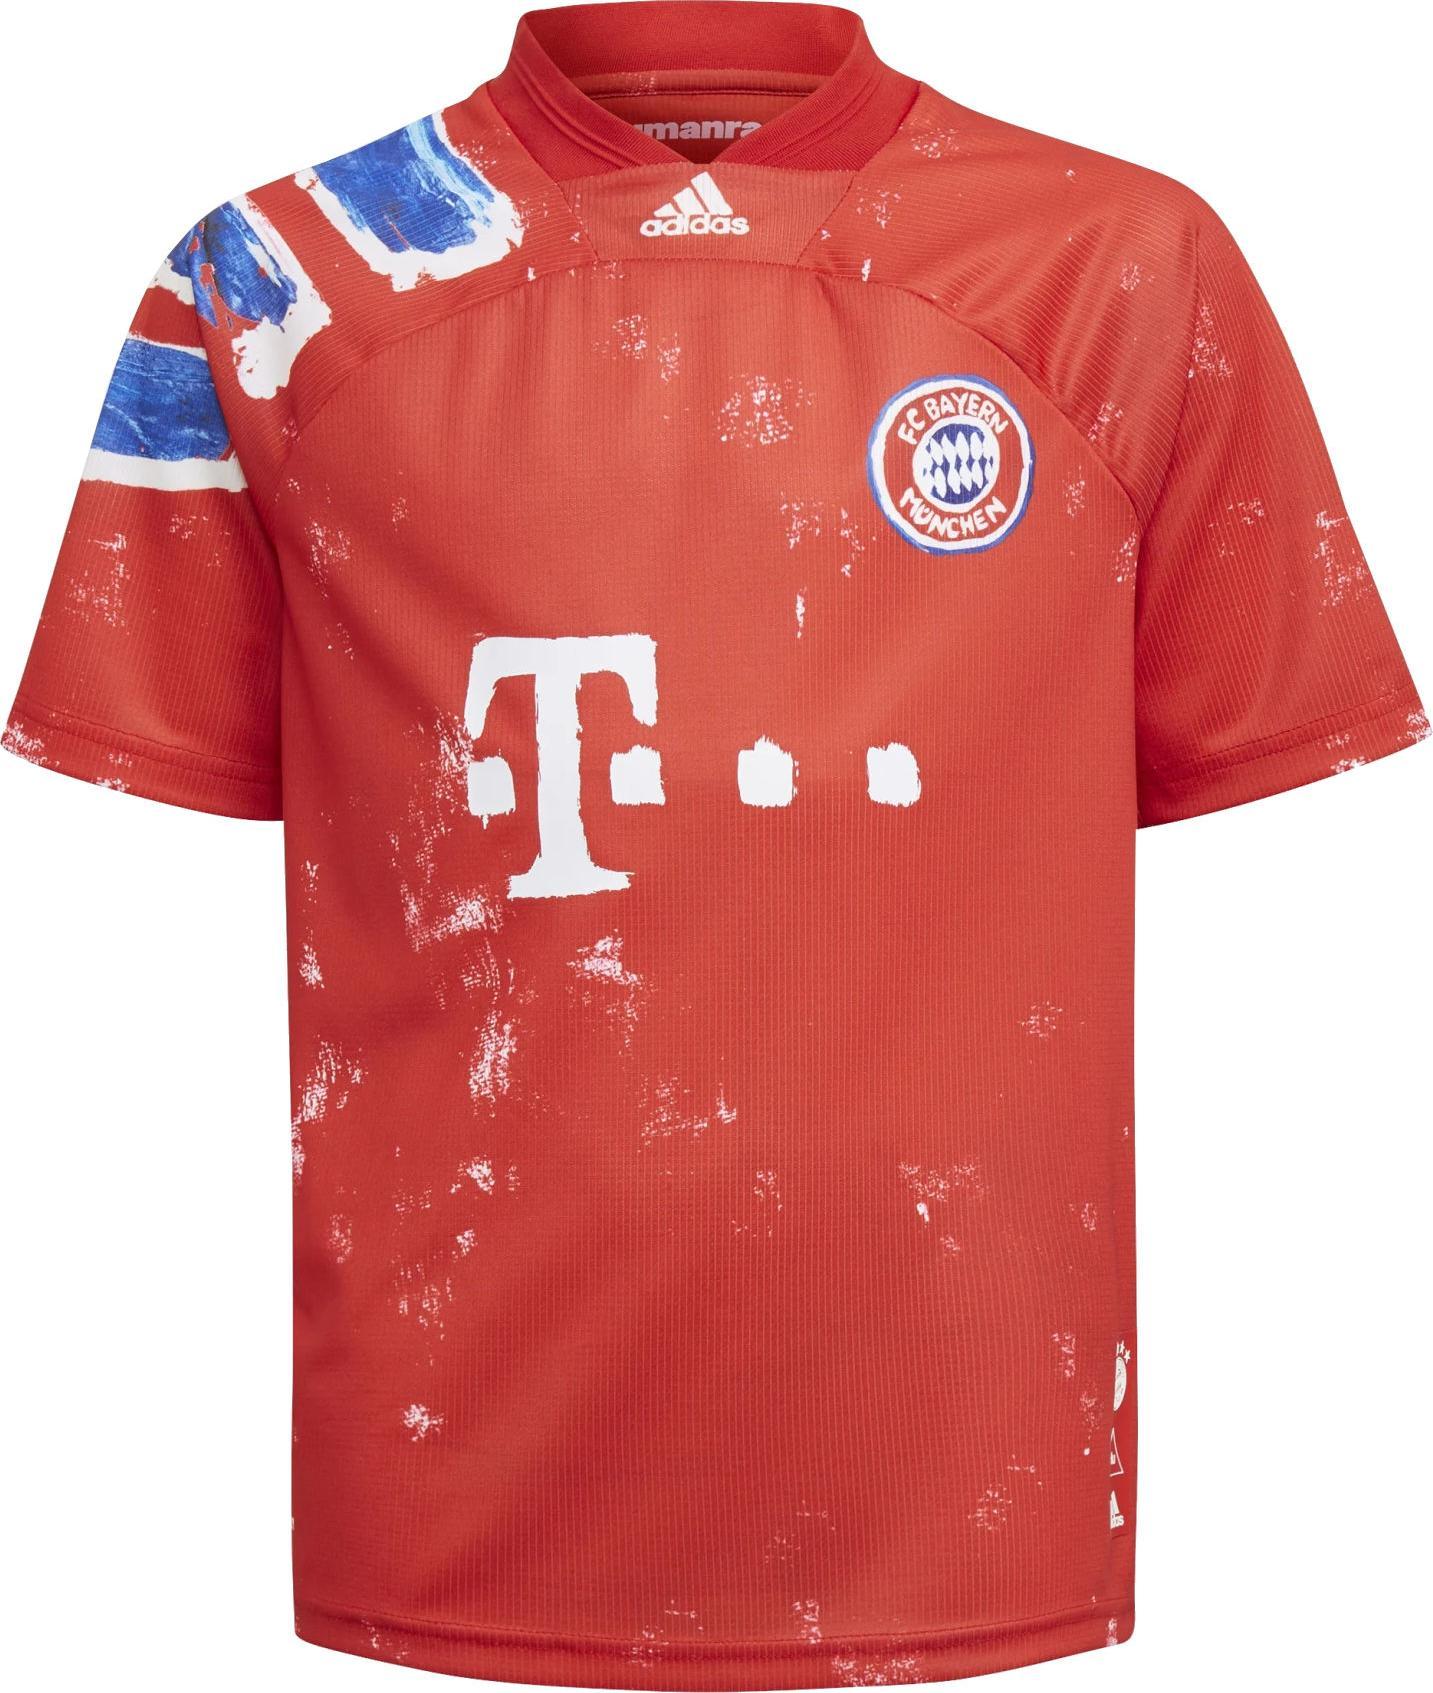 Shirt adidas FC BAYERN HUMAN RACE JERSEY YOUTH - Top4Football.com